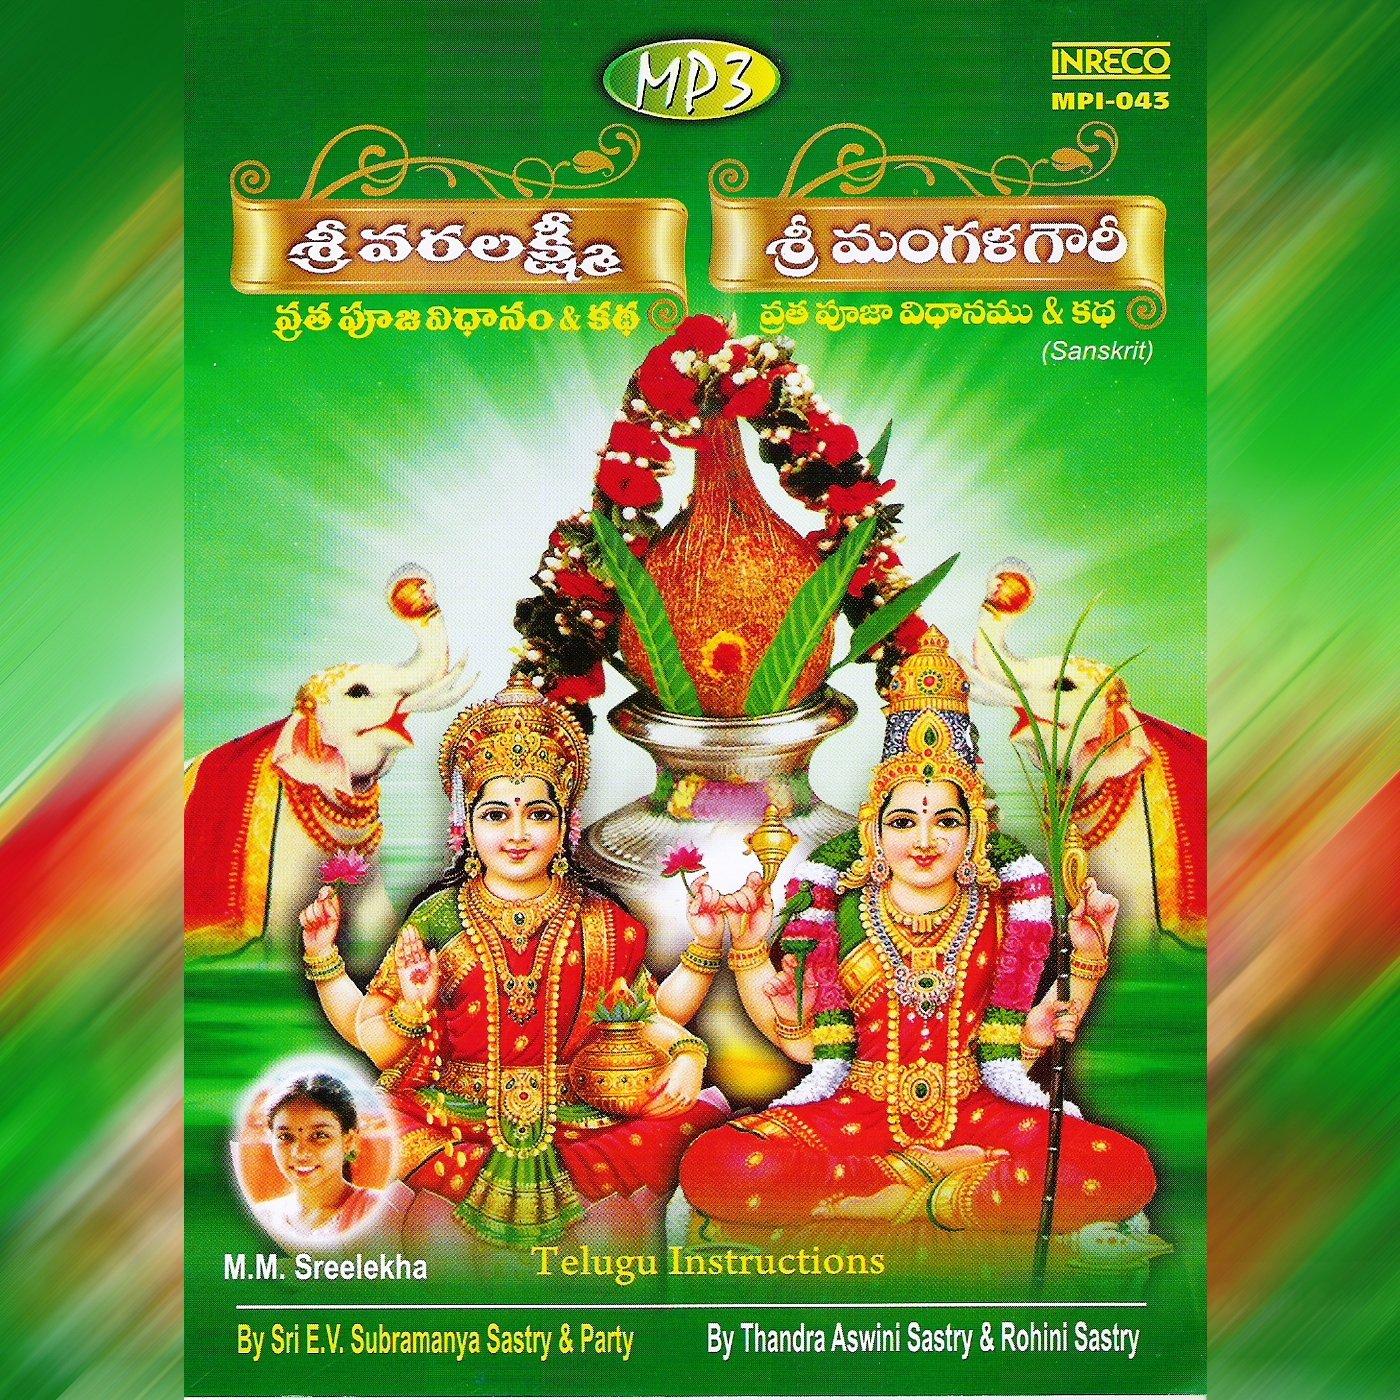 Bhakti Sudha Telugu Mp3 Songs Free Download - impactpigi